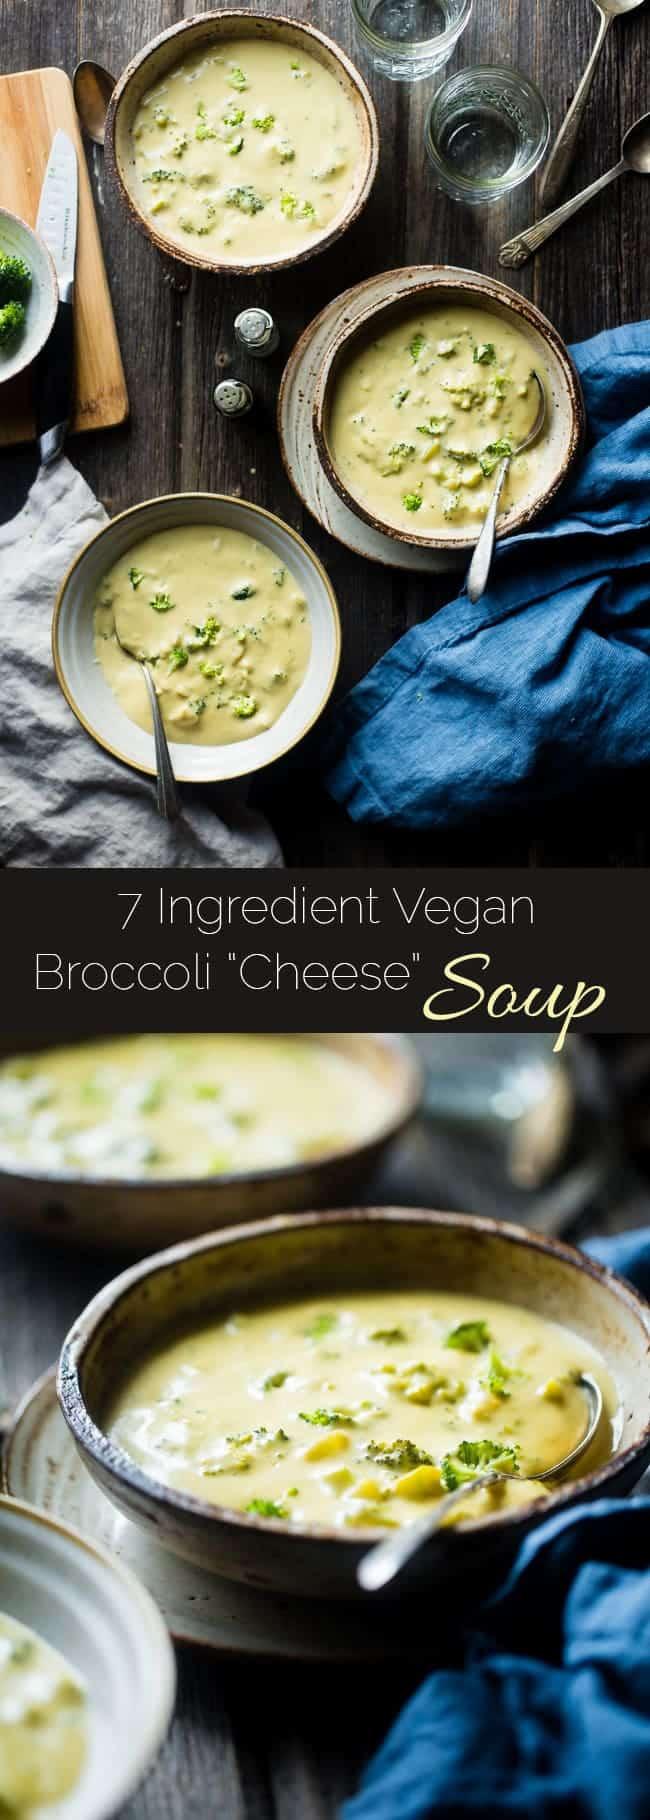 Vegan Broccoli Cheese Soup  Vegan Broccoli Cheese Soup